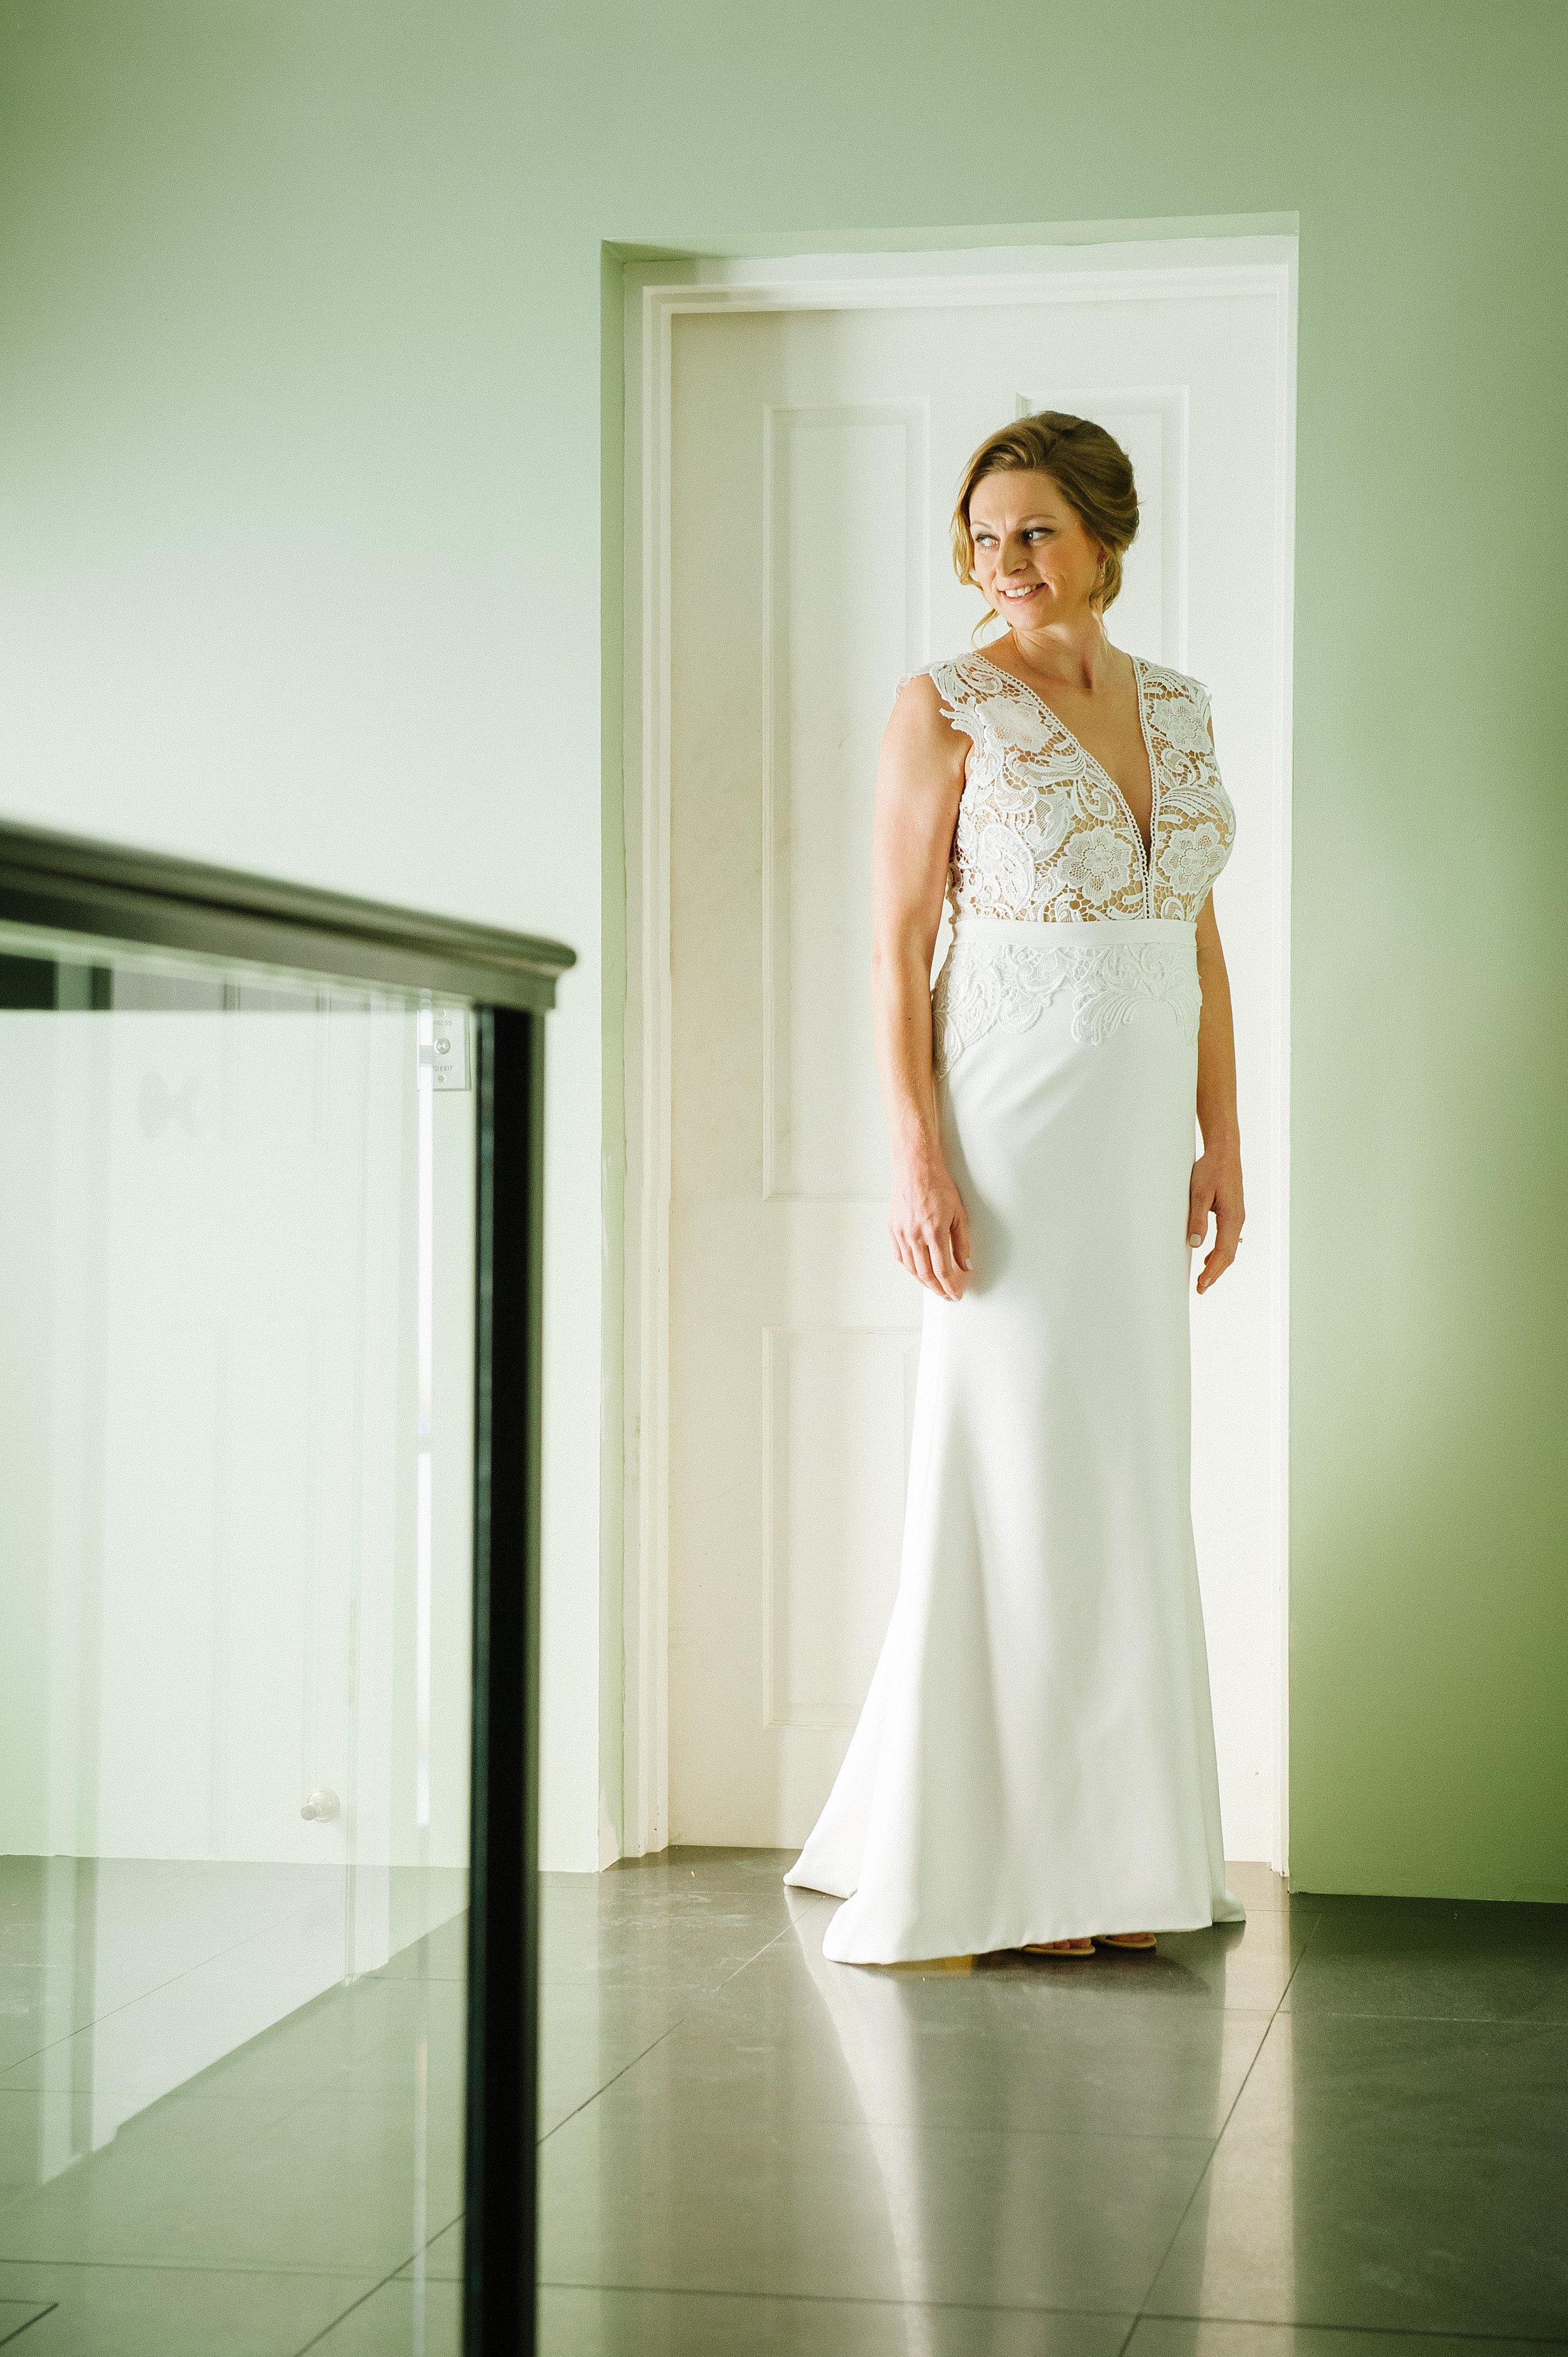 Marryme_wedding_photography_dorrigo_bellingen_photographer_12.jpg